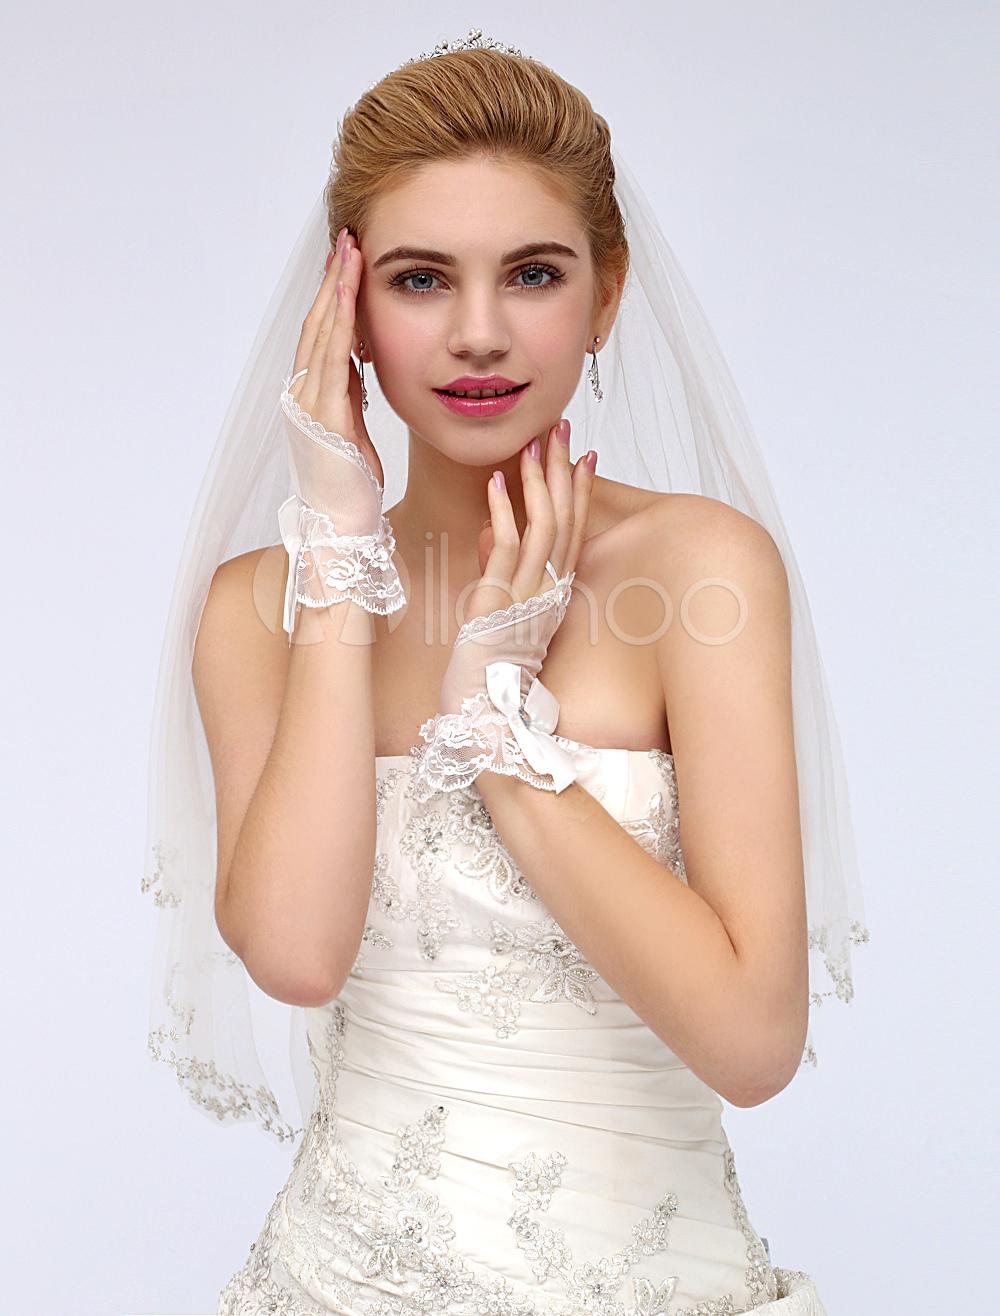 White Tulle Wrist Length Glamorous Bow Fingerless Lace Wedding Gloves